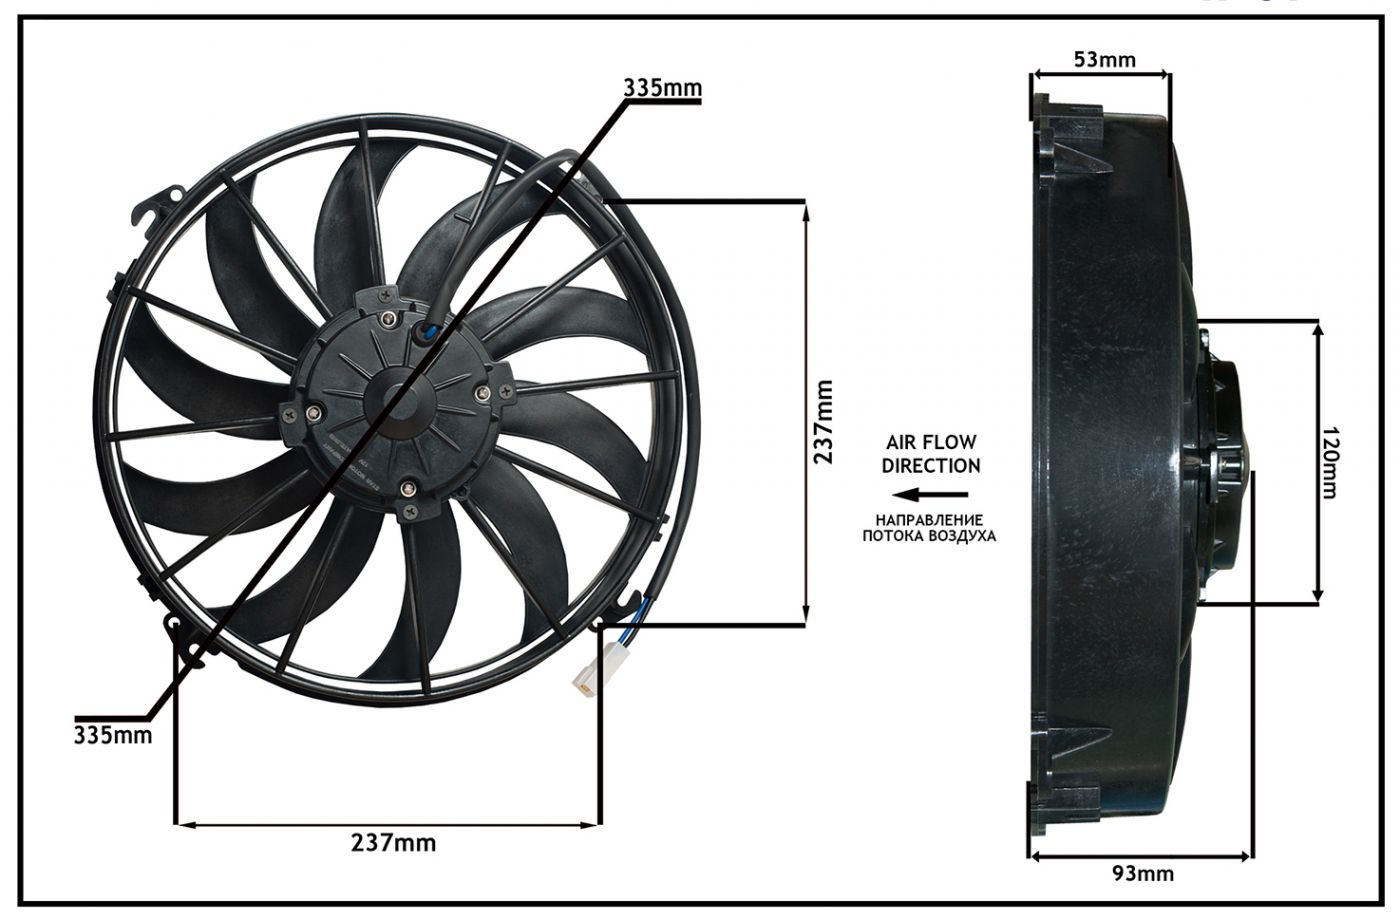 "Осевой вентилятор 12"" дюймов, 170W, 12V, Нагнетающий (PUSH), STR 119"